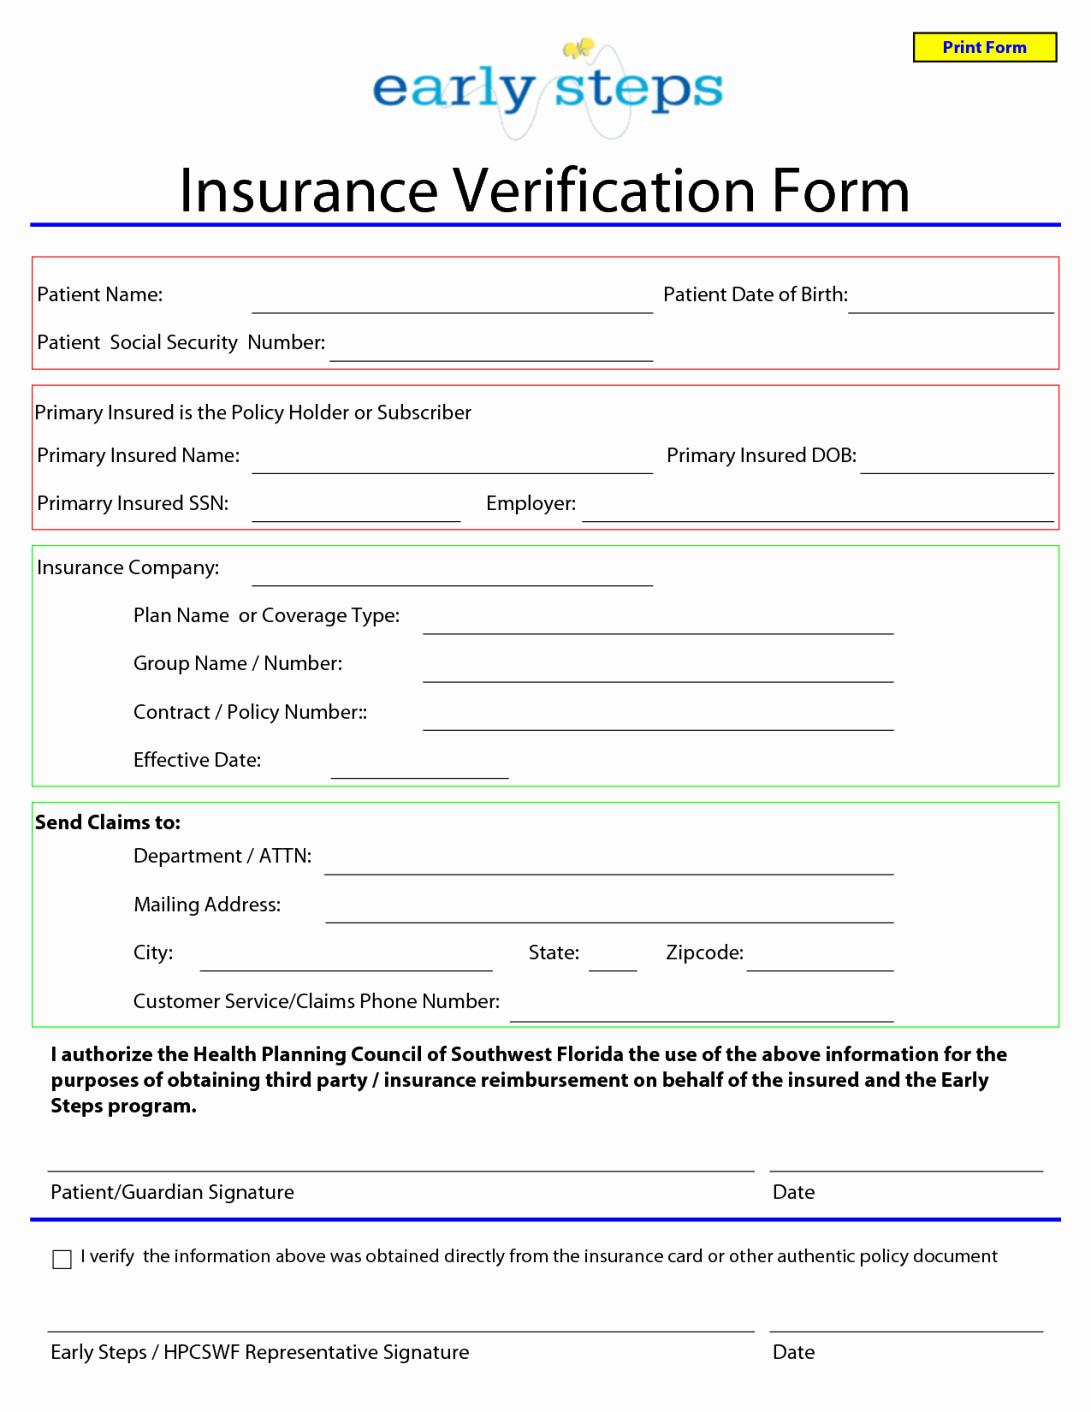 Free Blank Insurance Card Template Fresh Card Template Insurance Car Download Fake Progressive Free